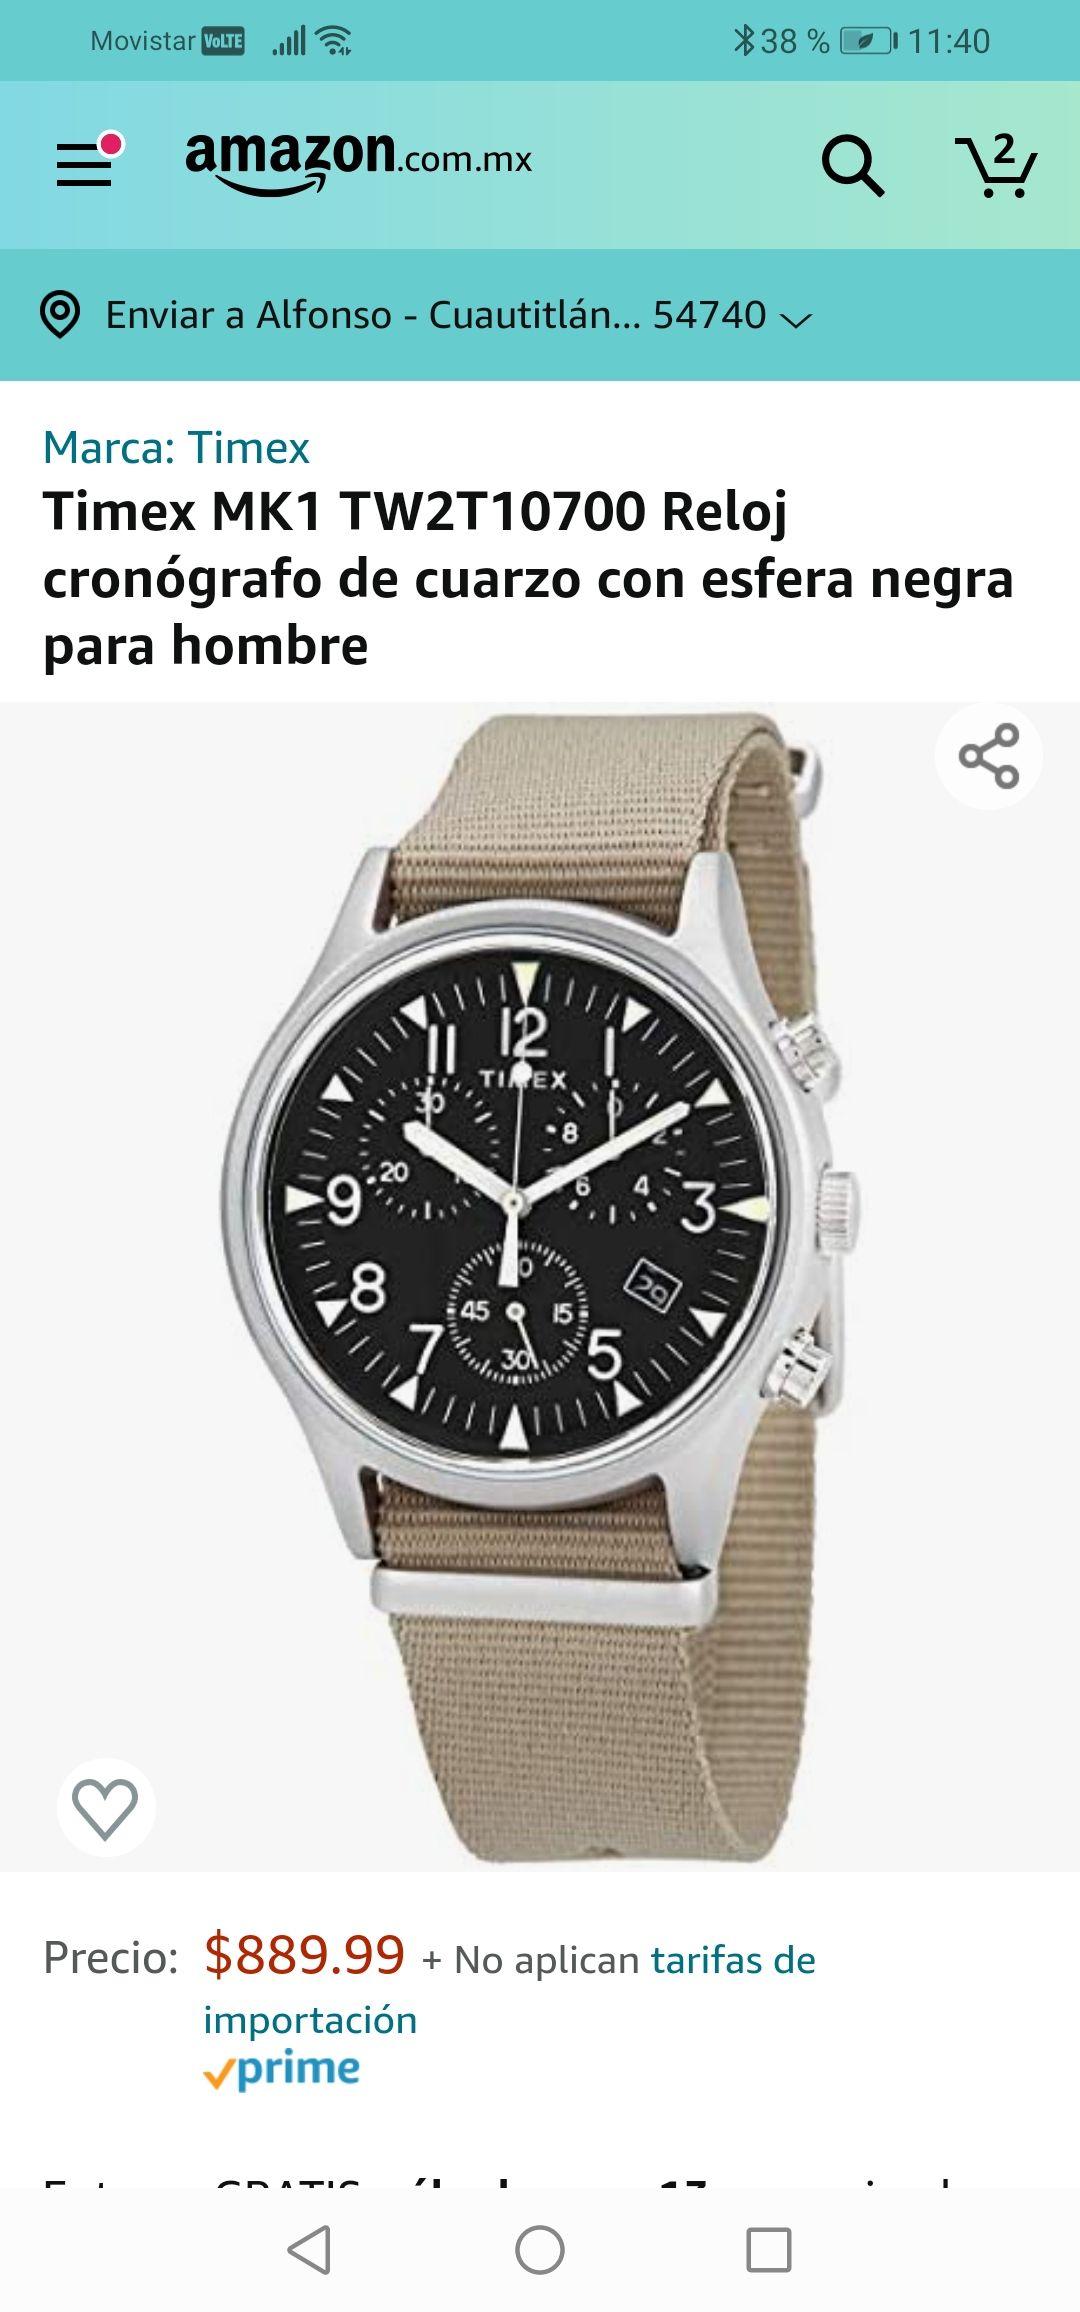 Amazon : Timex MK1 TW2T10700 Reloj cronógrafo de cuarzo con esfera negra para hombre